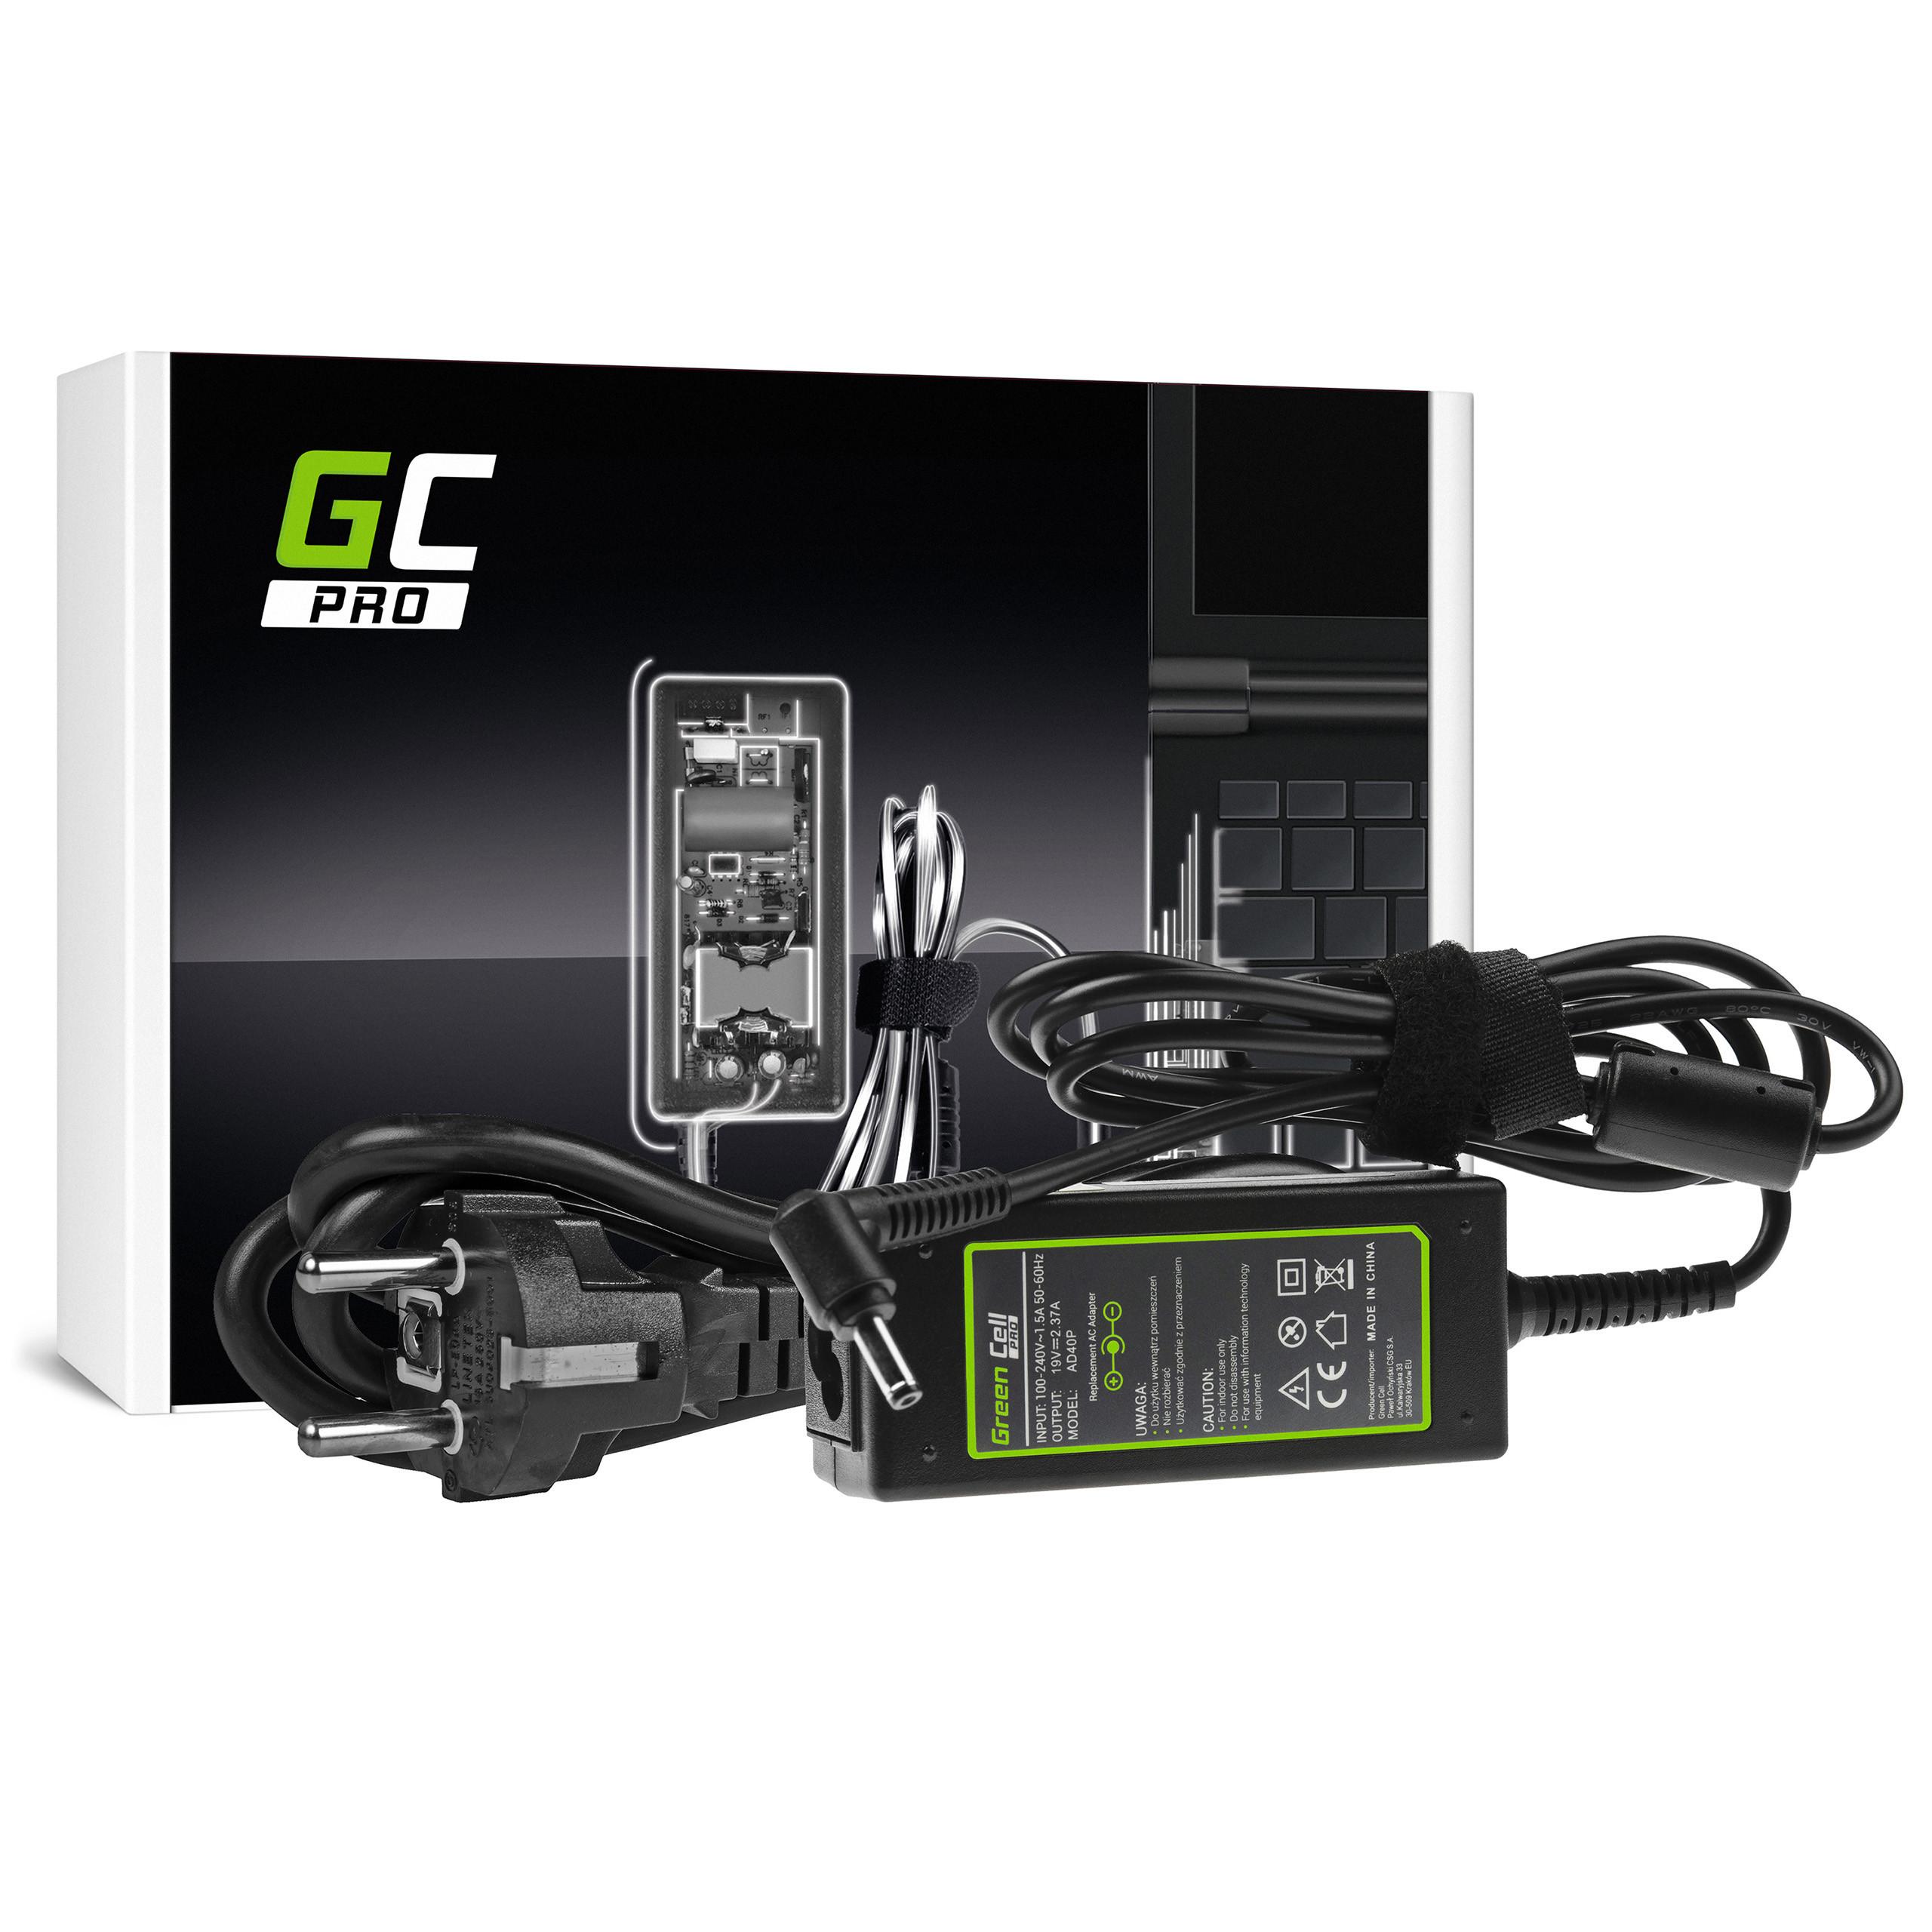 Green Cell AD40P Adaptér Nabíječka pro ASUS Zenbook BX21A 19V 2.37A | 45W | konektor 4.0mm-1.35mm